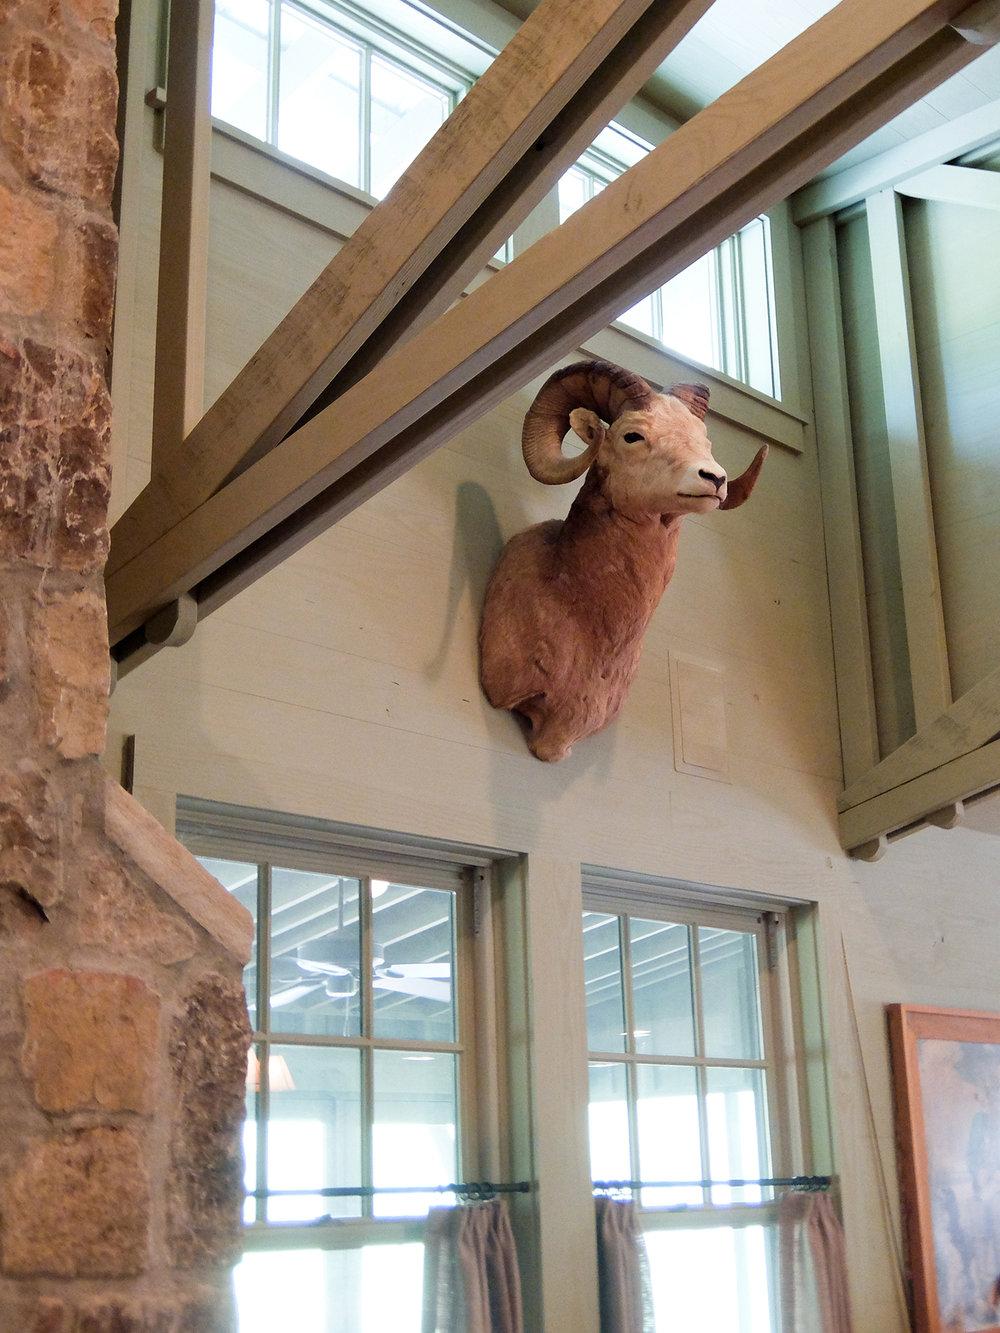 sugar_creek_farm_21_lakehouse_lake_house_stone_fireplace_vaulted_ceiling_clerestory_window_truss_farmhouse_1500.jpg